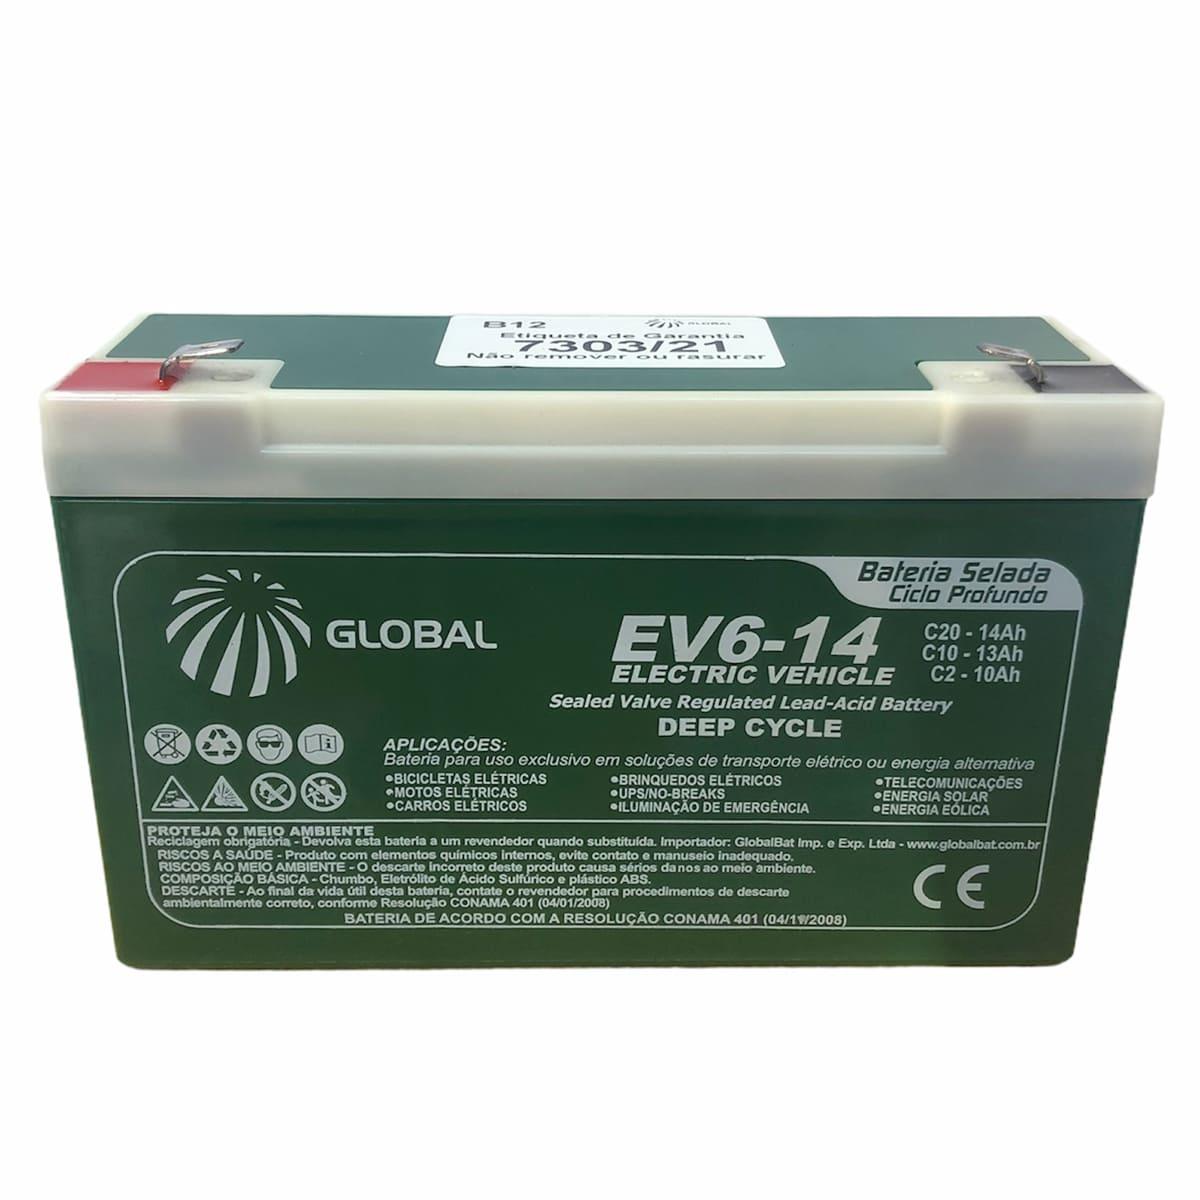 Bateria Selada Global 6V 14AH Ciclo Profundo VRLA EV6-14